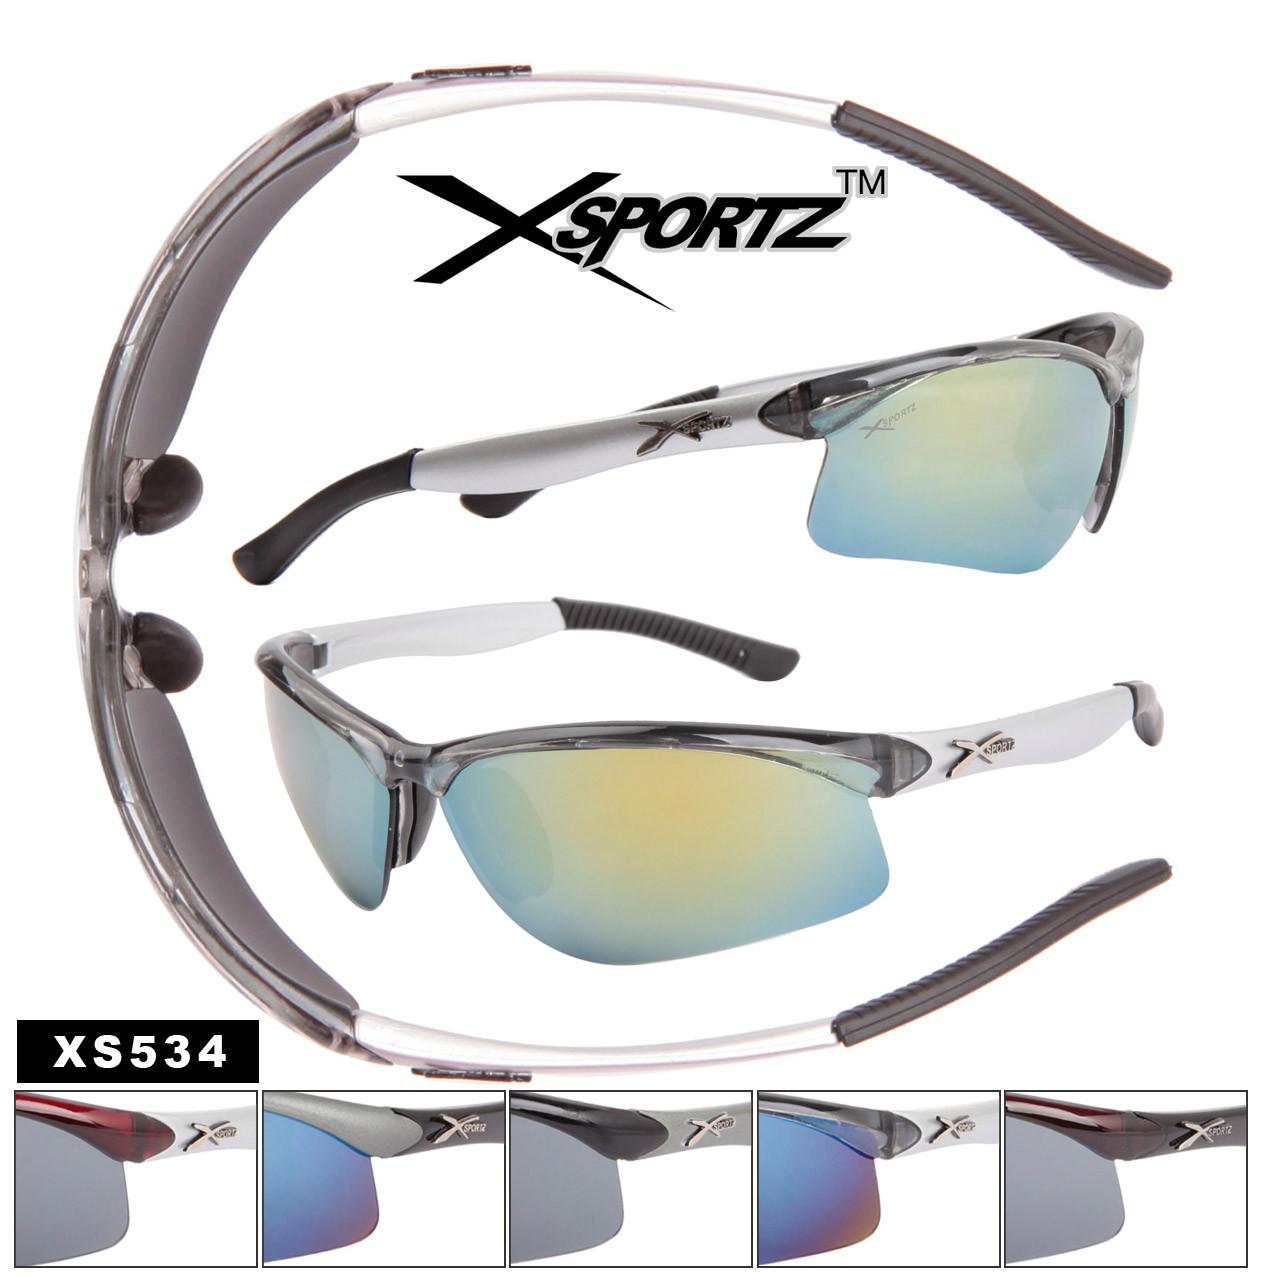 XS534 Wholesale Sports Sunglasses